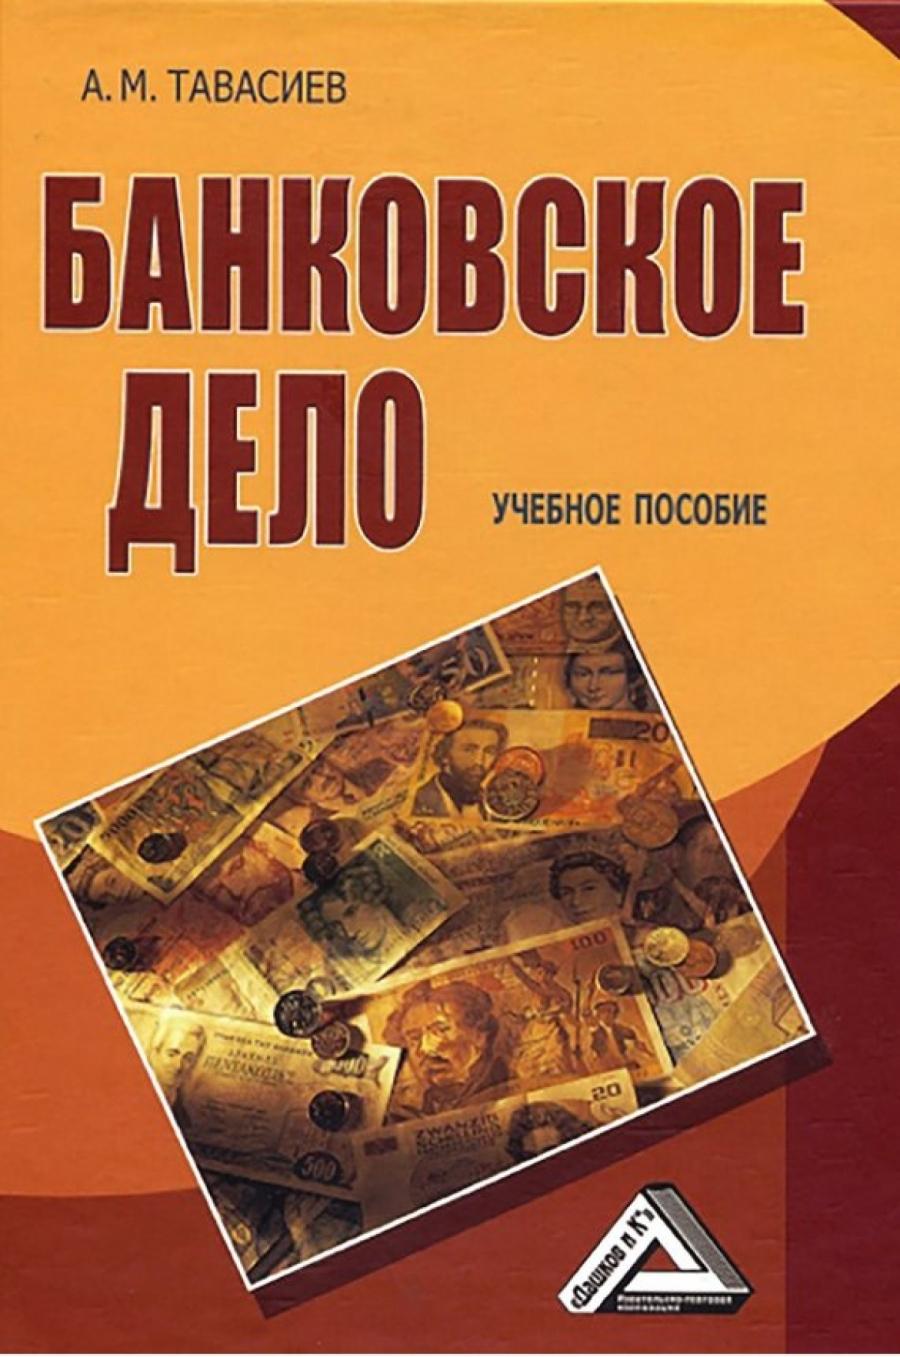 Обложка книги:  а.м. тавасиев - банковское дело